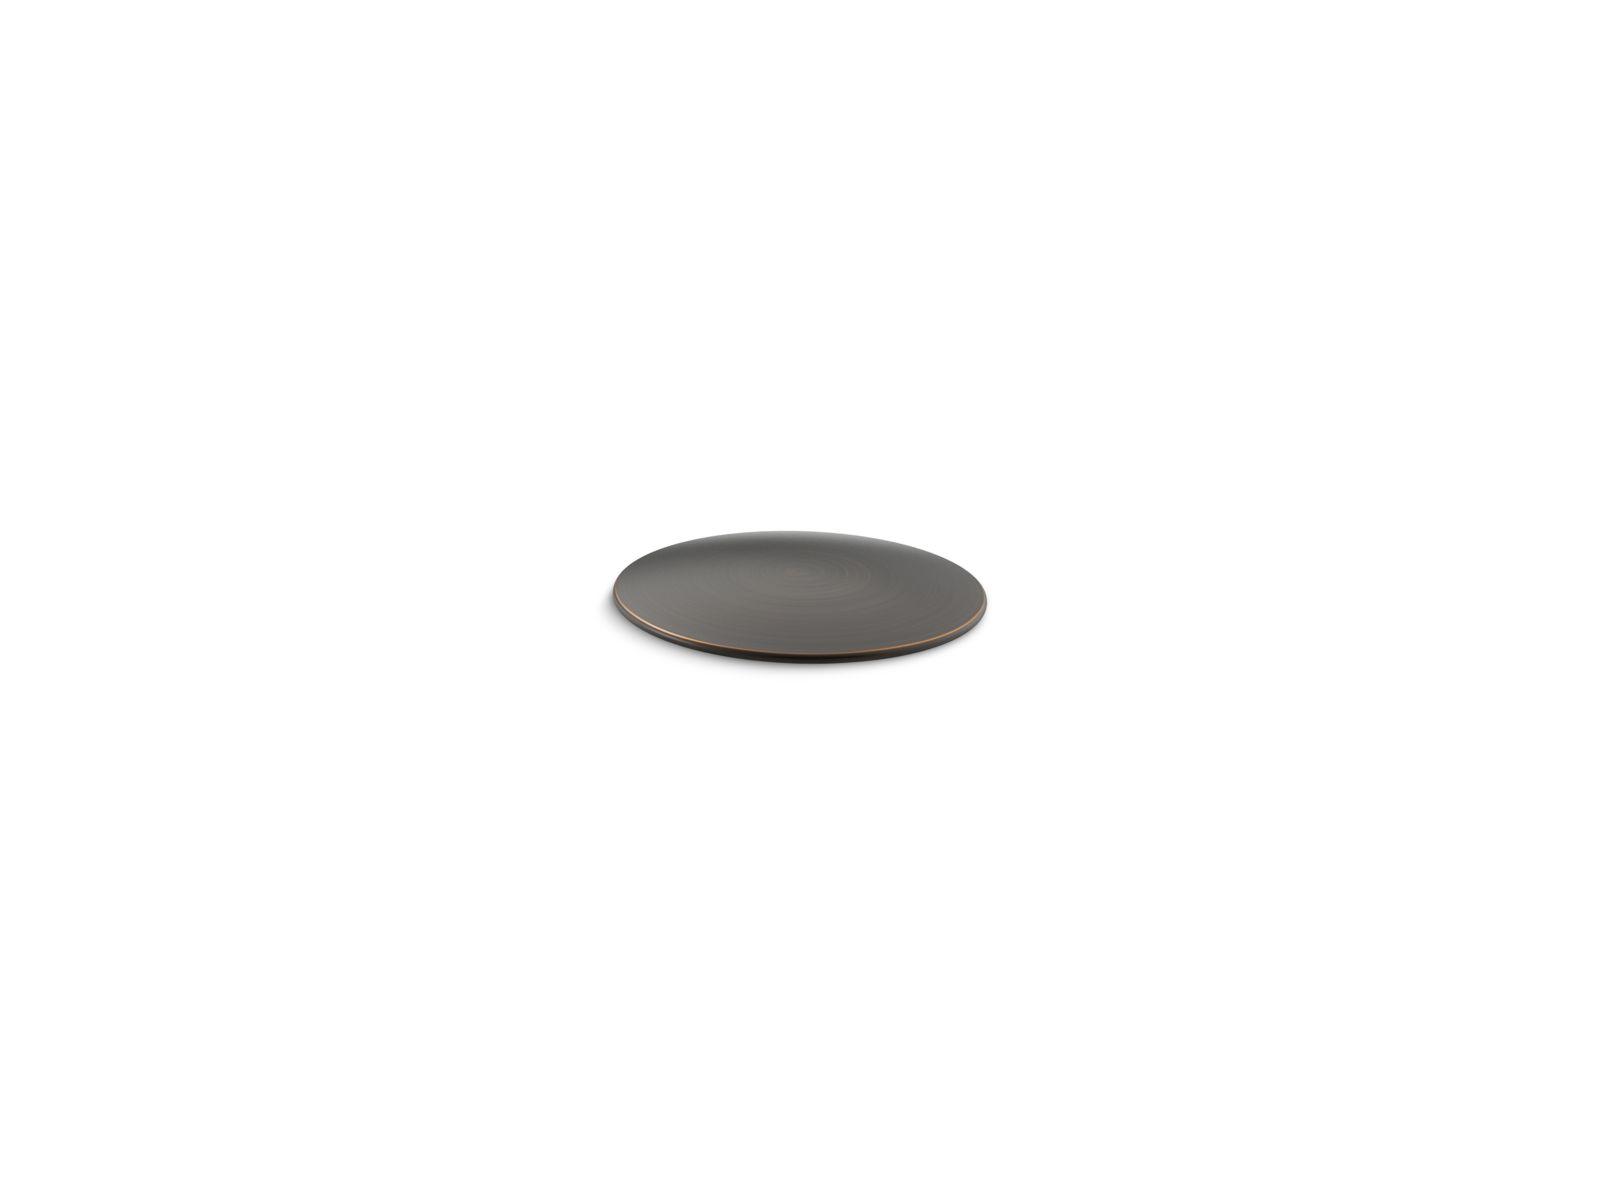 Kohler K-8830-2BZ Kitchen and Bathroom Sink Extra Hole Cover Oil Rubbed Bronze